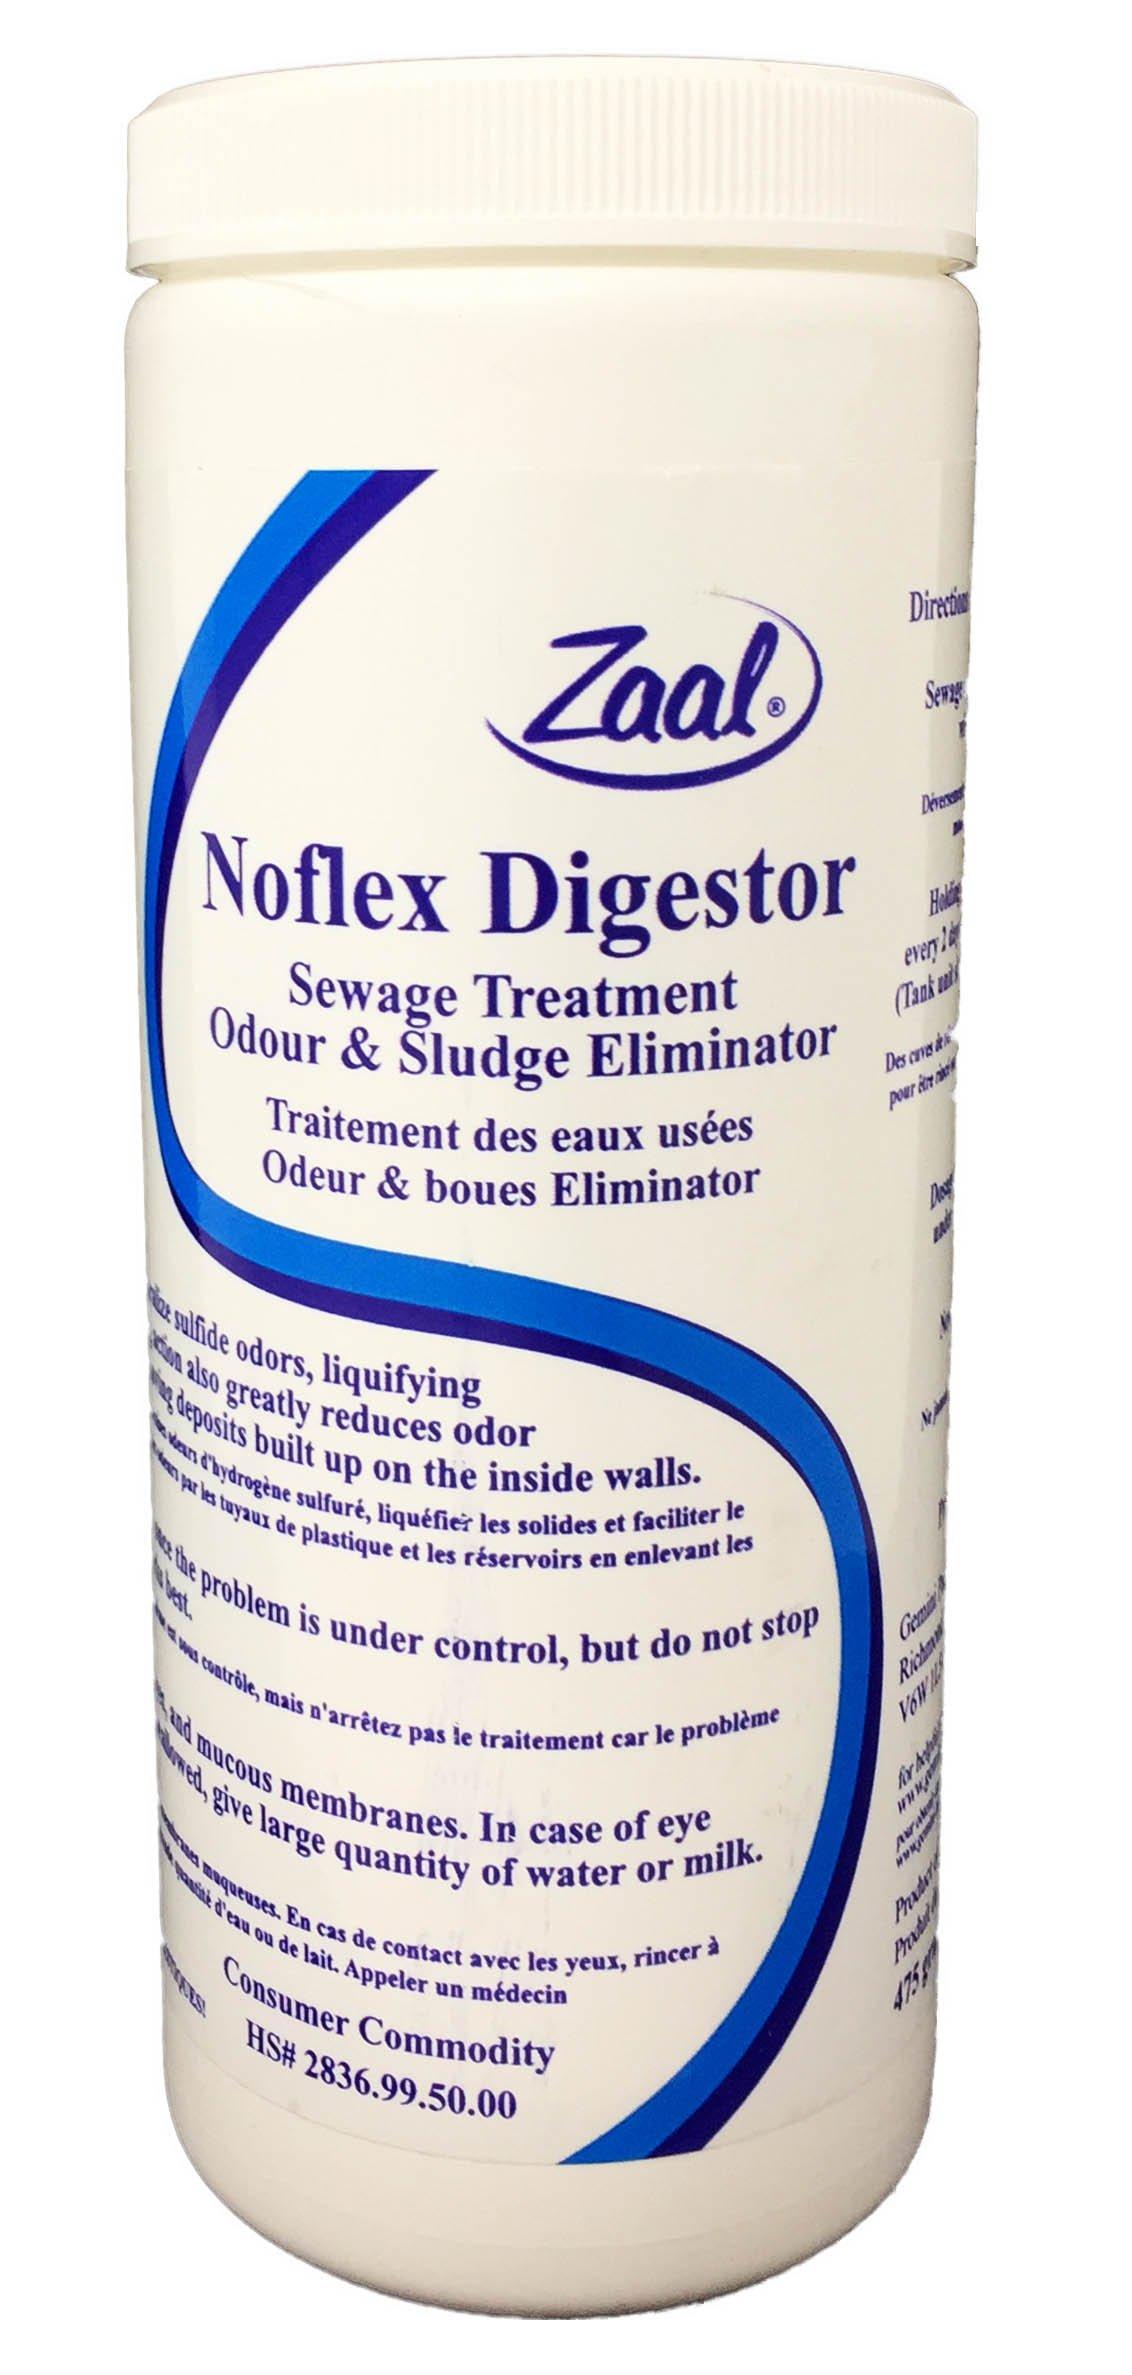 BoatersMate Zaal Noflex Digestor Sewage Treatment Odour & Sludge Eliminator